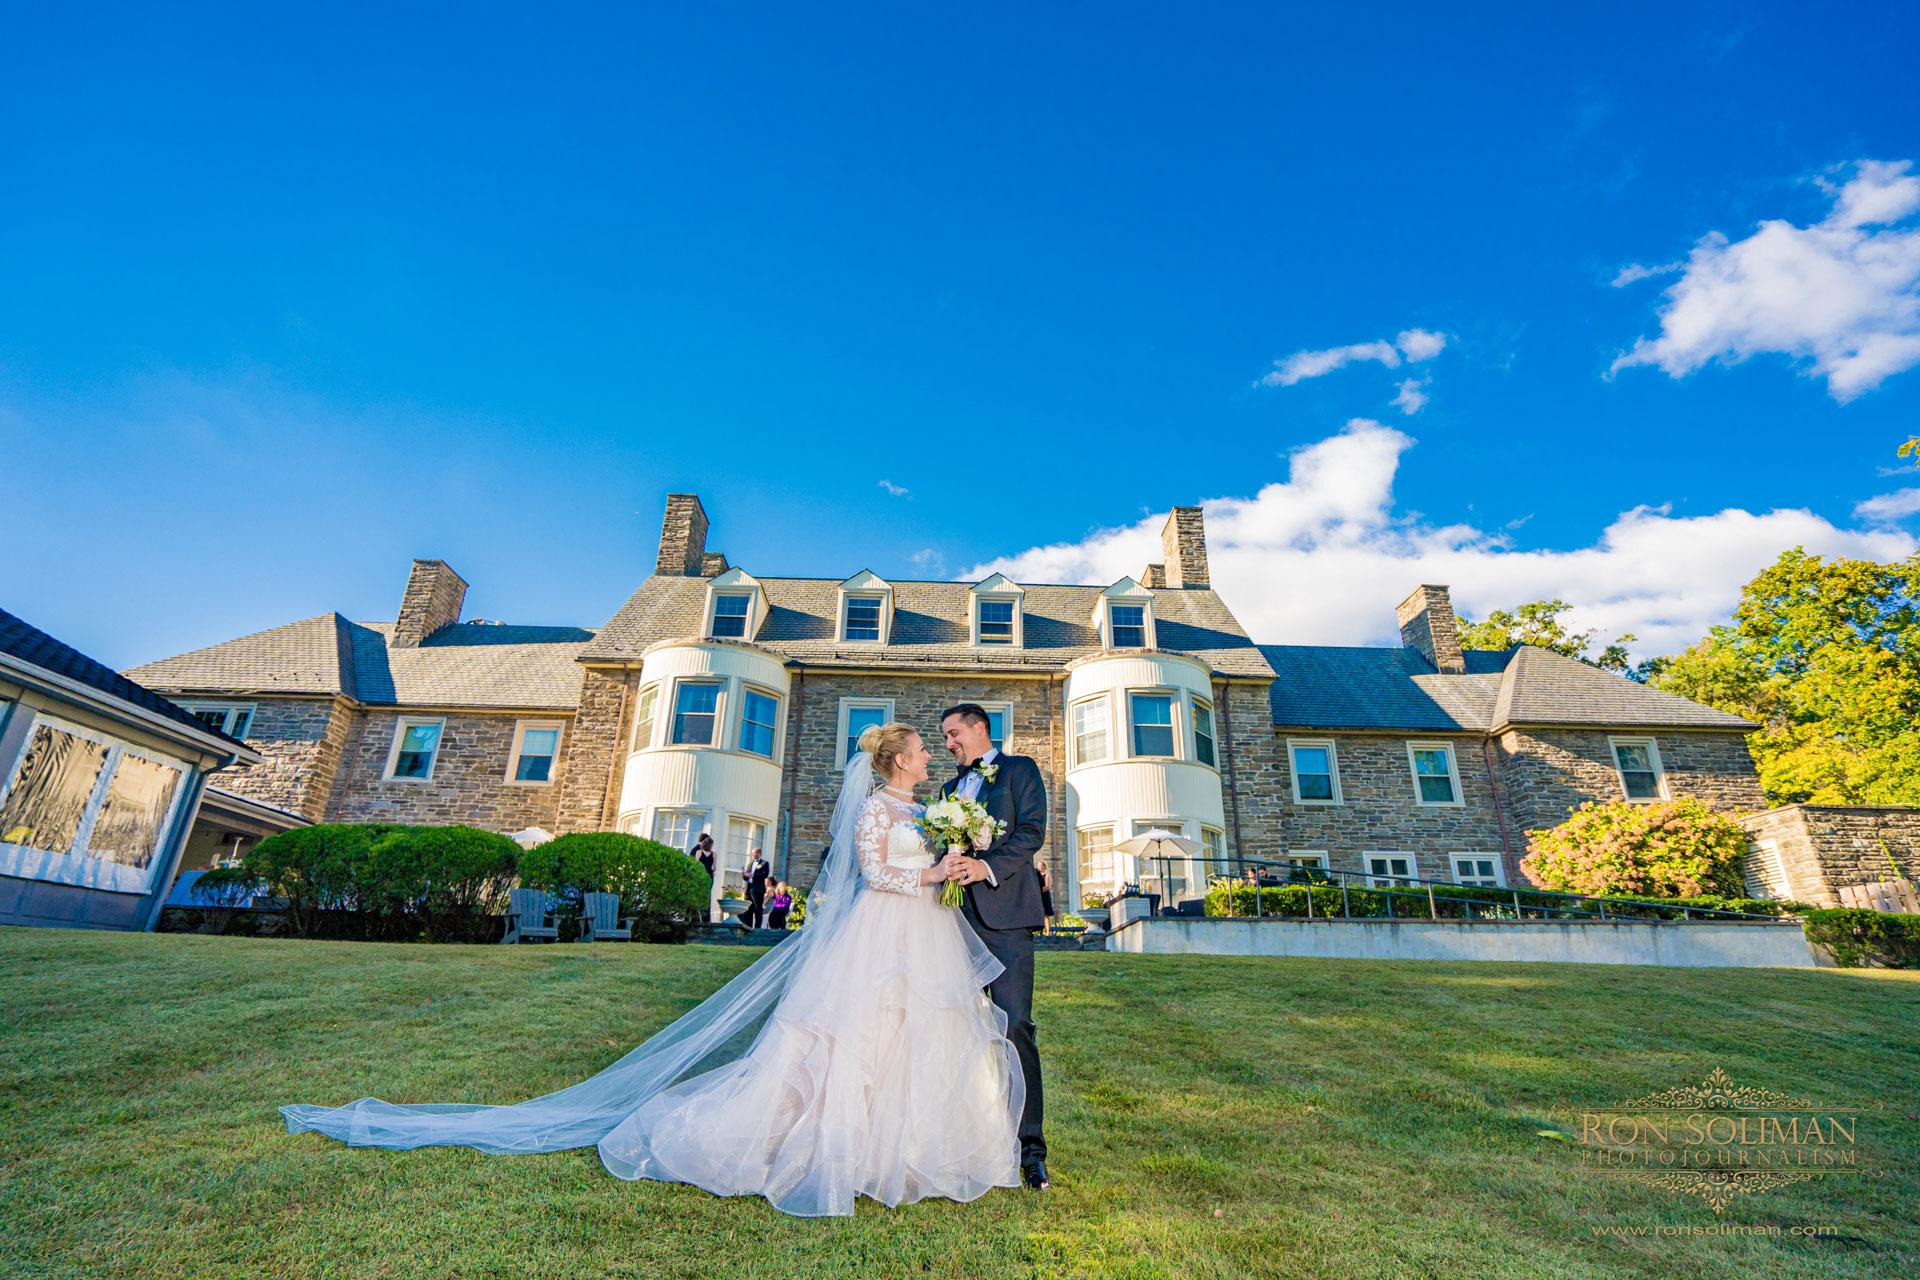 ALVERTHORPE MANOR HOUSE WEDDING 20